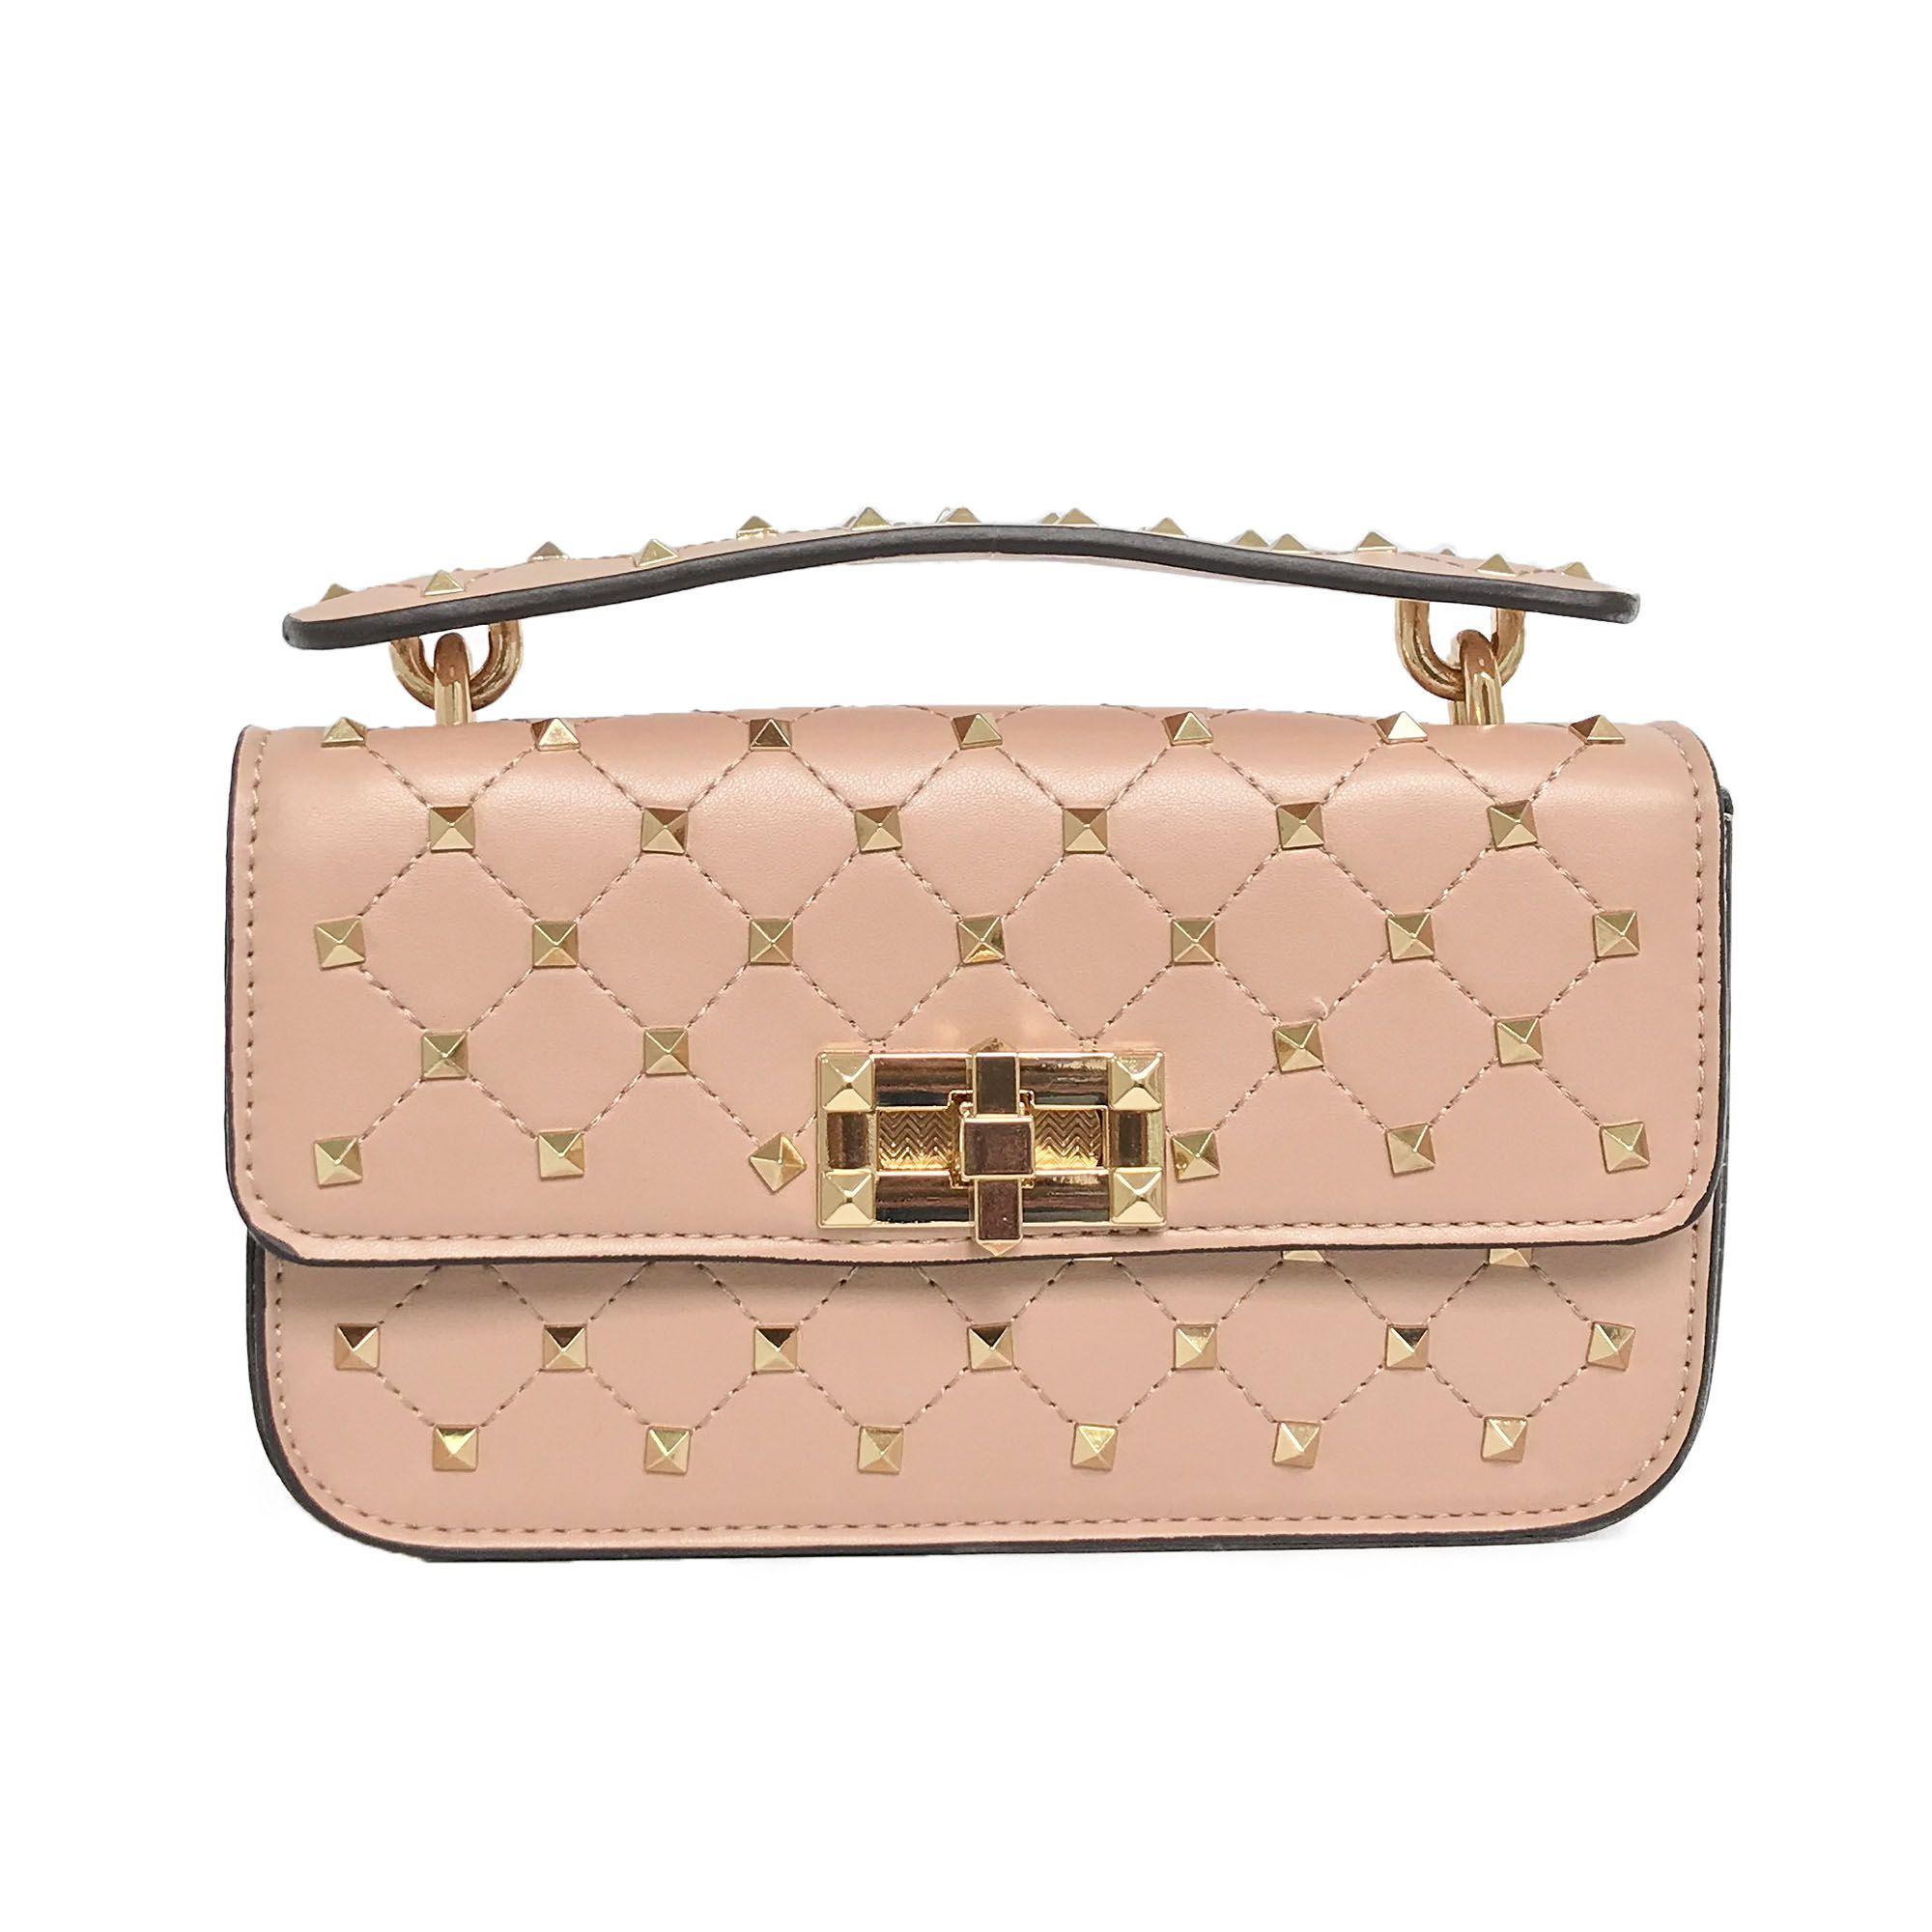 9fde5eaa6 Aymorez - Bolsa Mini Bag com Spikes Nude AY061-6